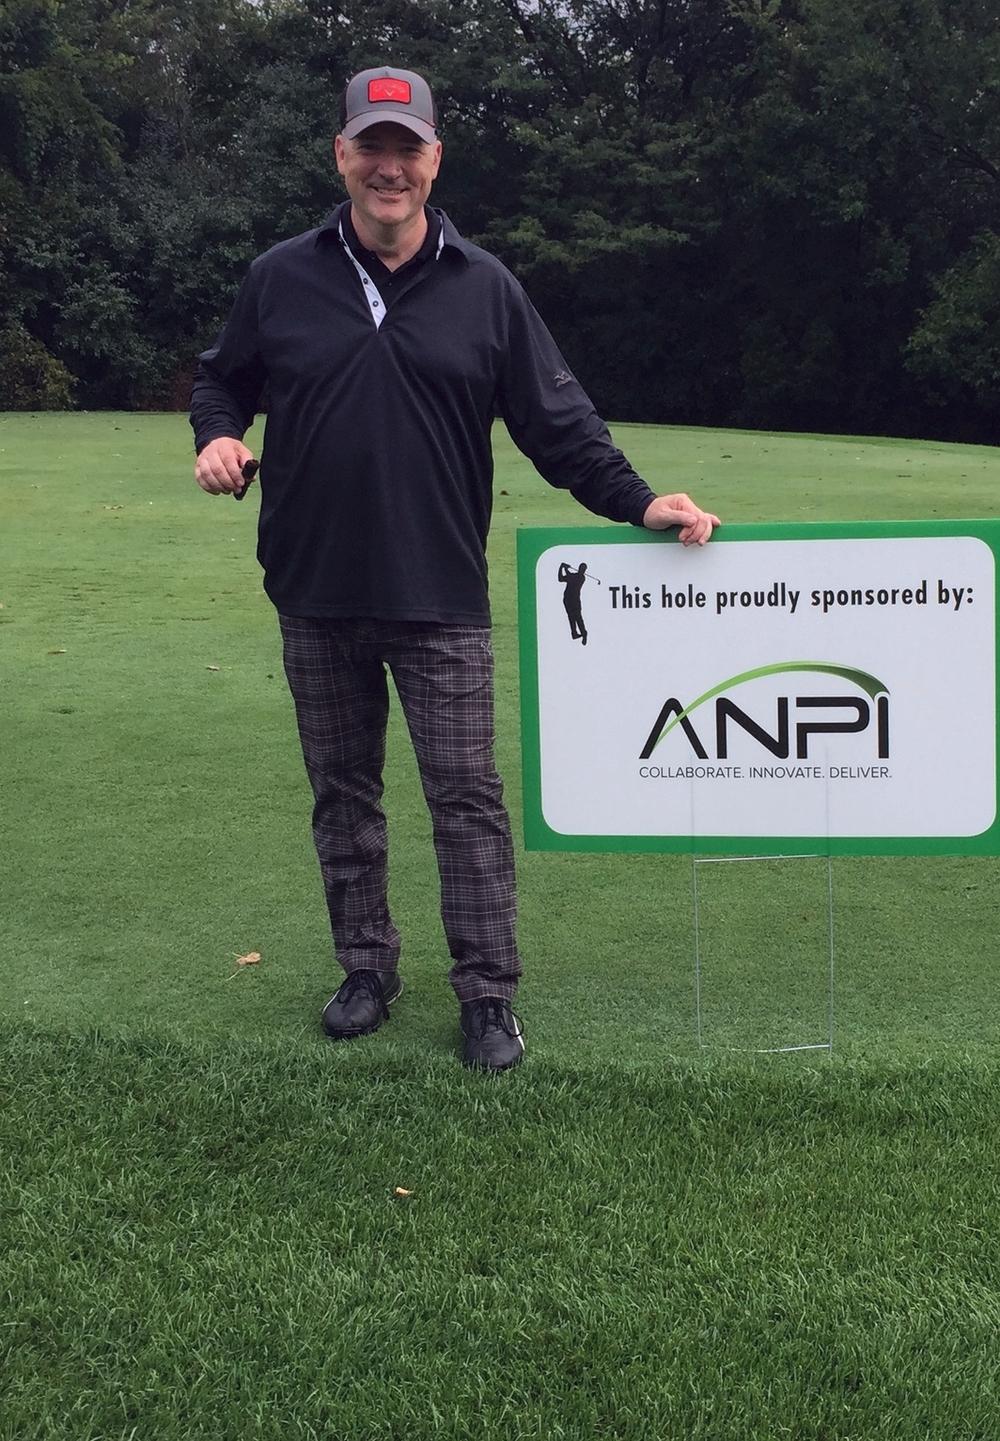 Todd w/ ANPI sponsorship